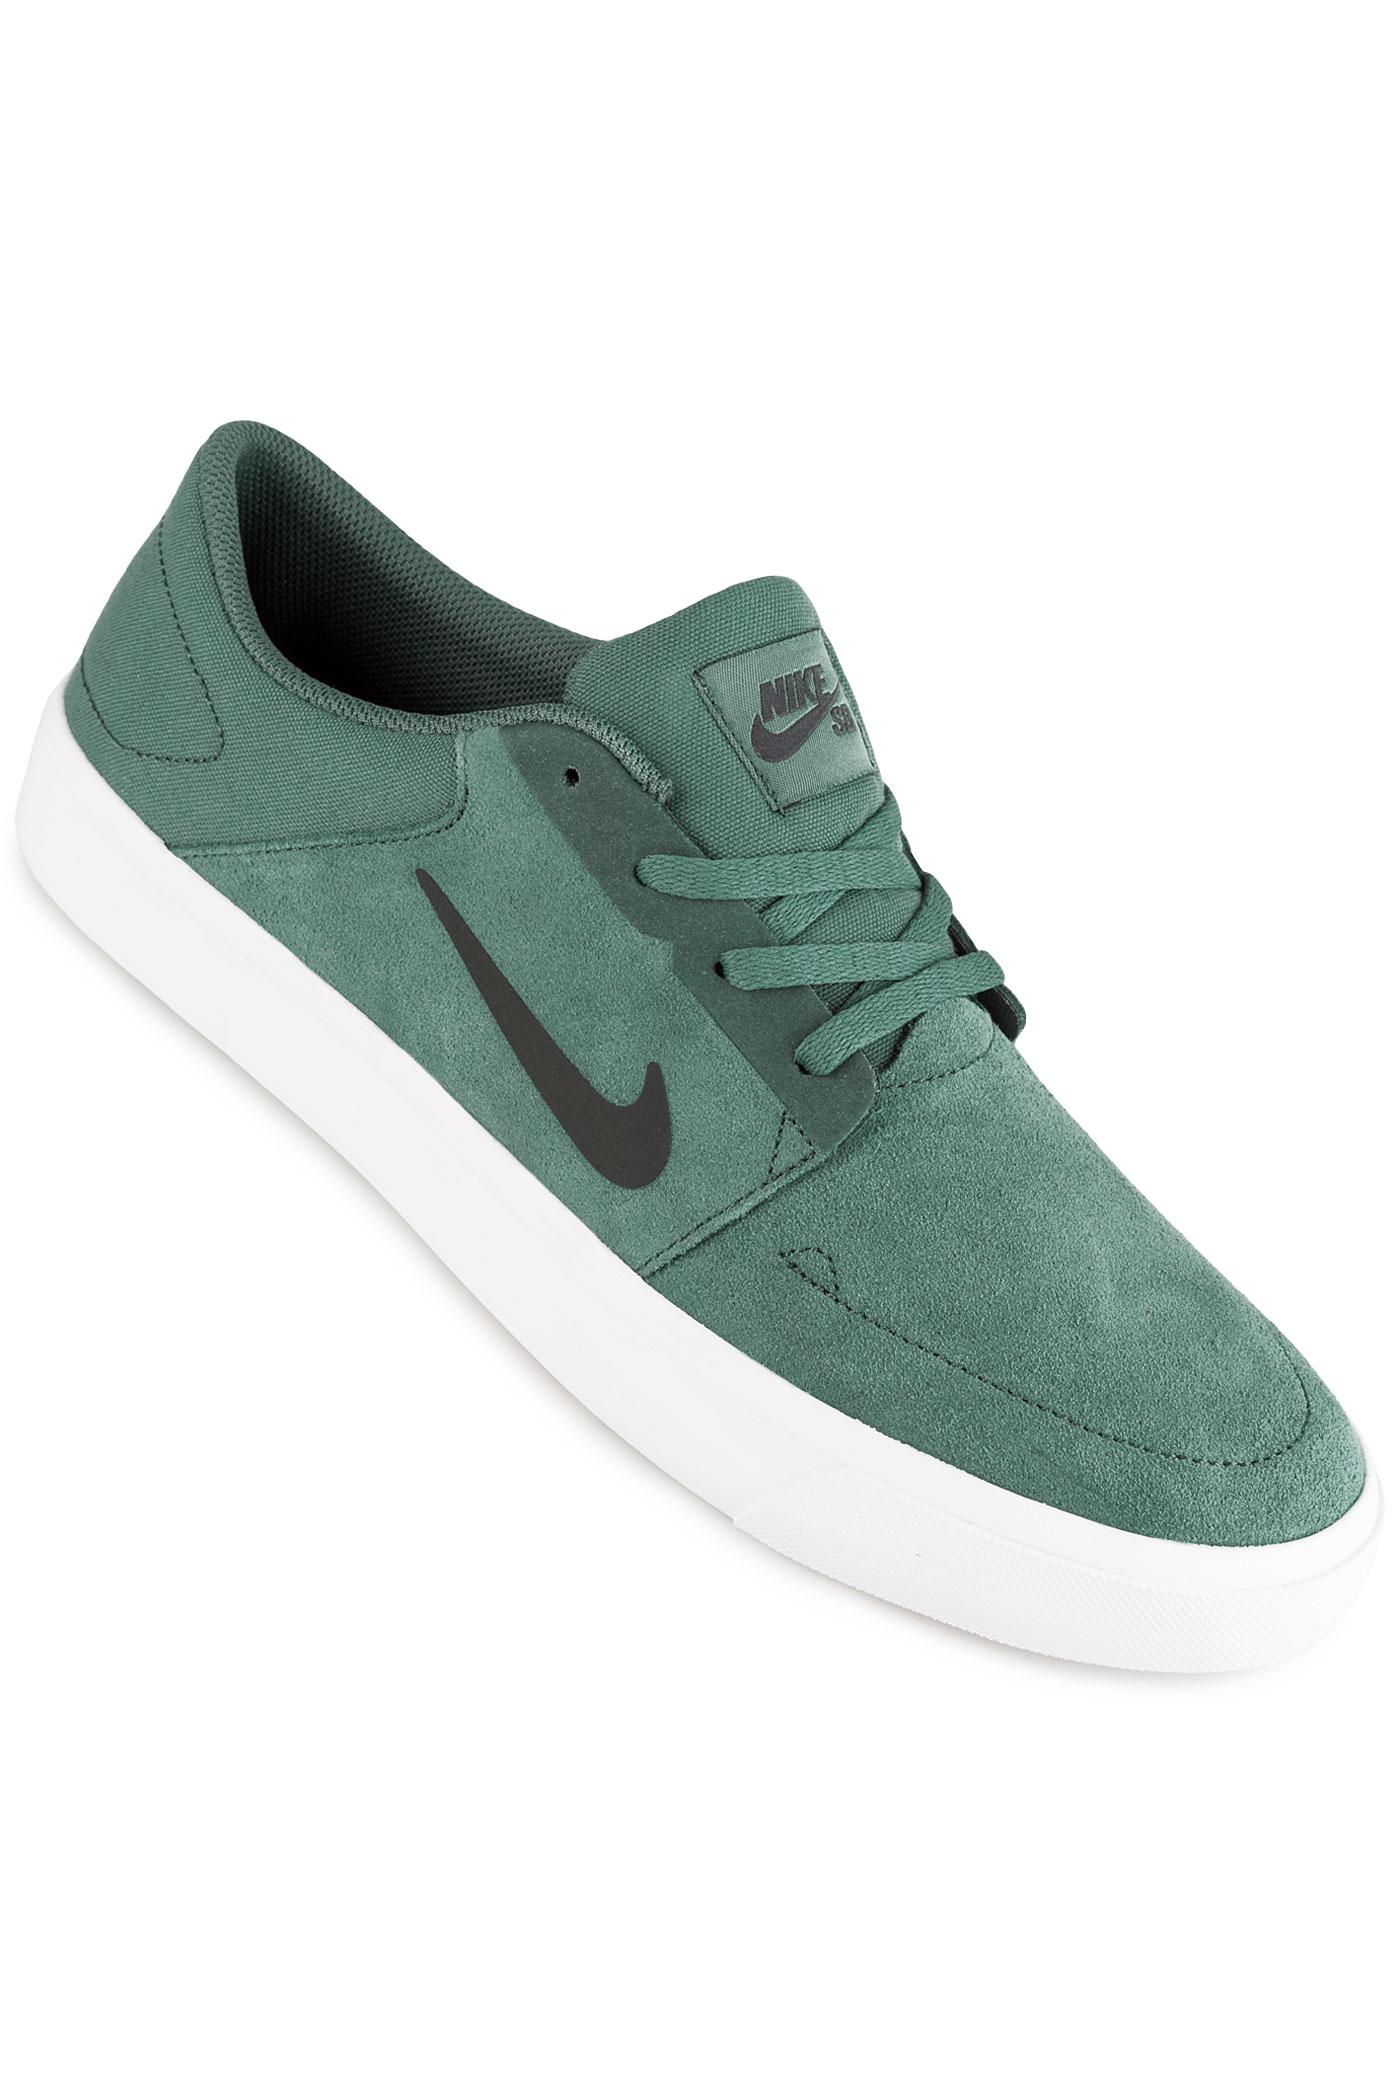 Nike Portmore Shoe Revierw